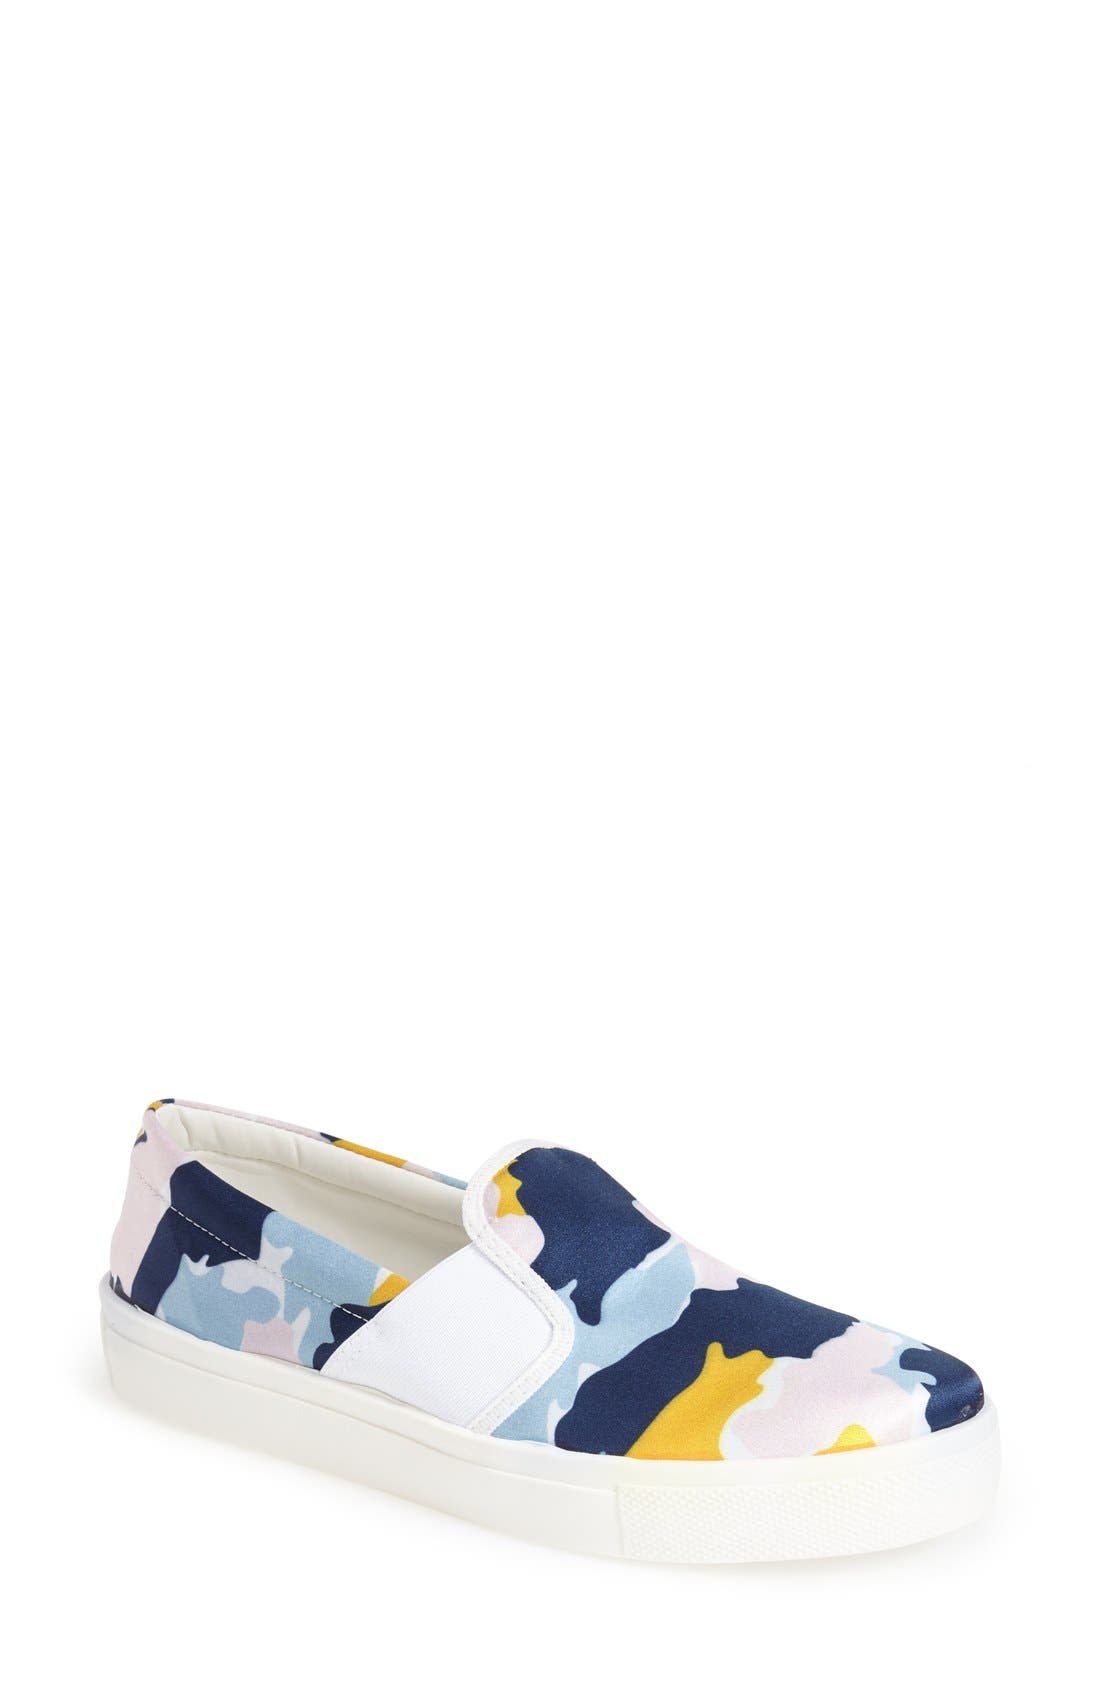 Alternate Image 1 Selected - Topshop 'Tiga - Smudge Print' Slip-On Skater Shoe (Women)